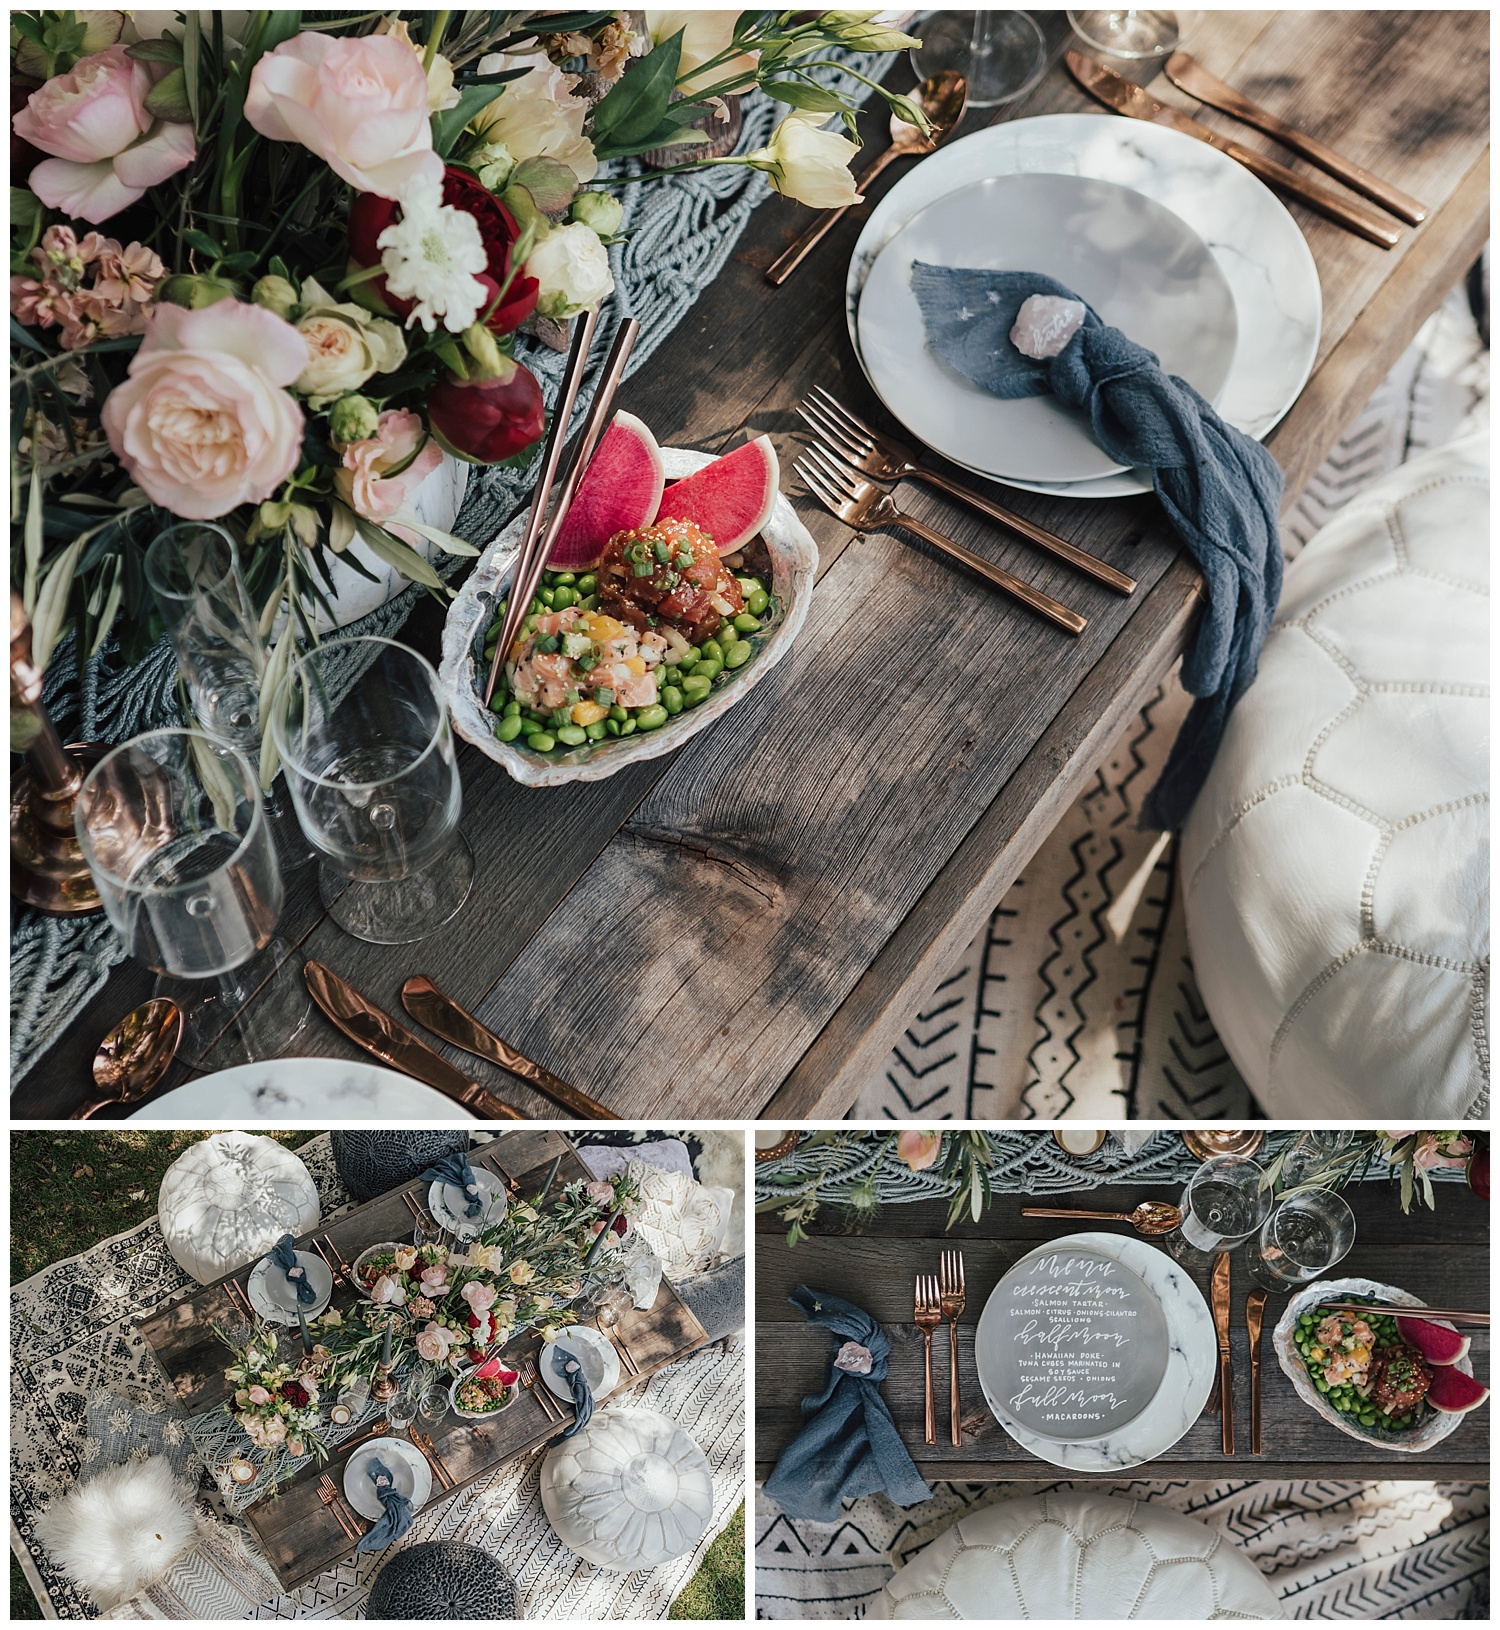 boho-wedding-table-setting.jpg